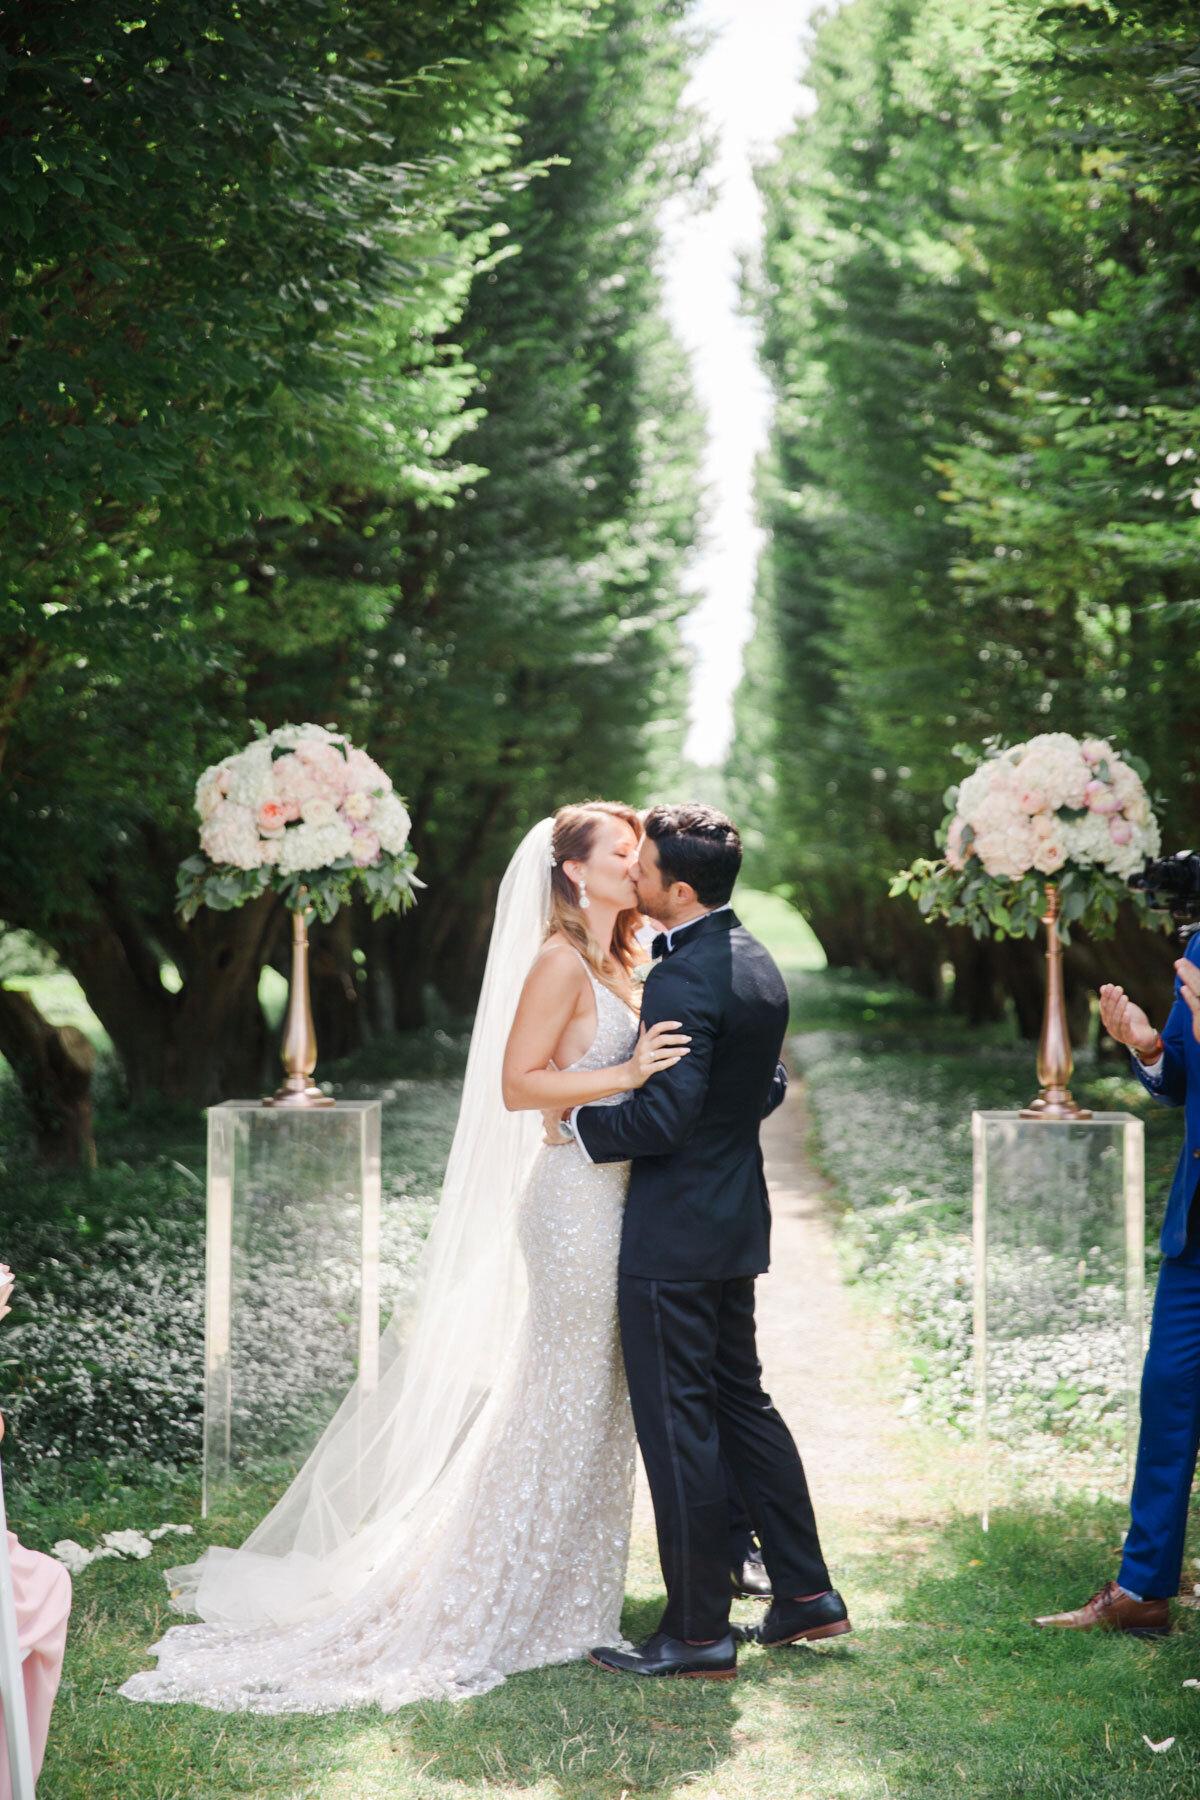 Chateau-des-Charmes-Wedding-Summer-Vineyard-Bride-Niagara-on-the-Lake-photos-by-Gemini-Photography-Ontario-0019.jpg